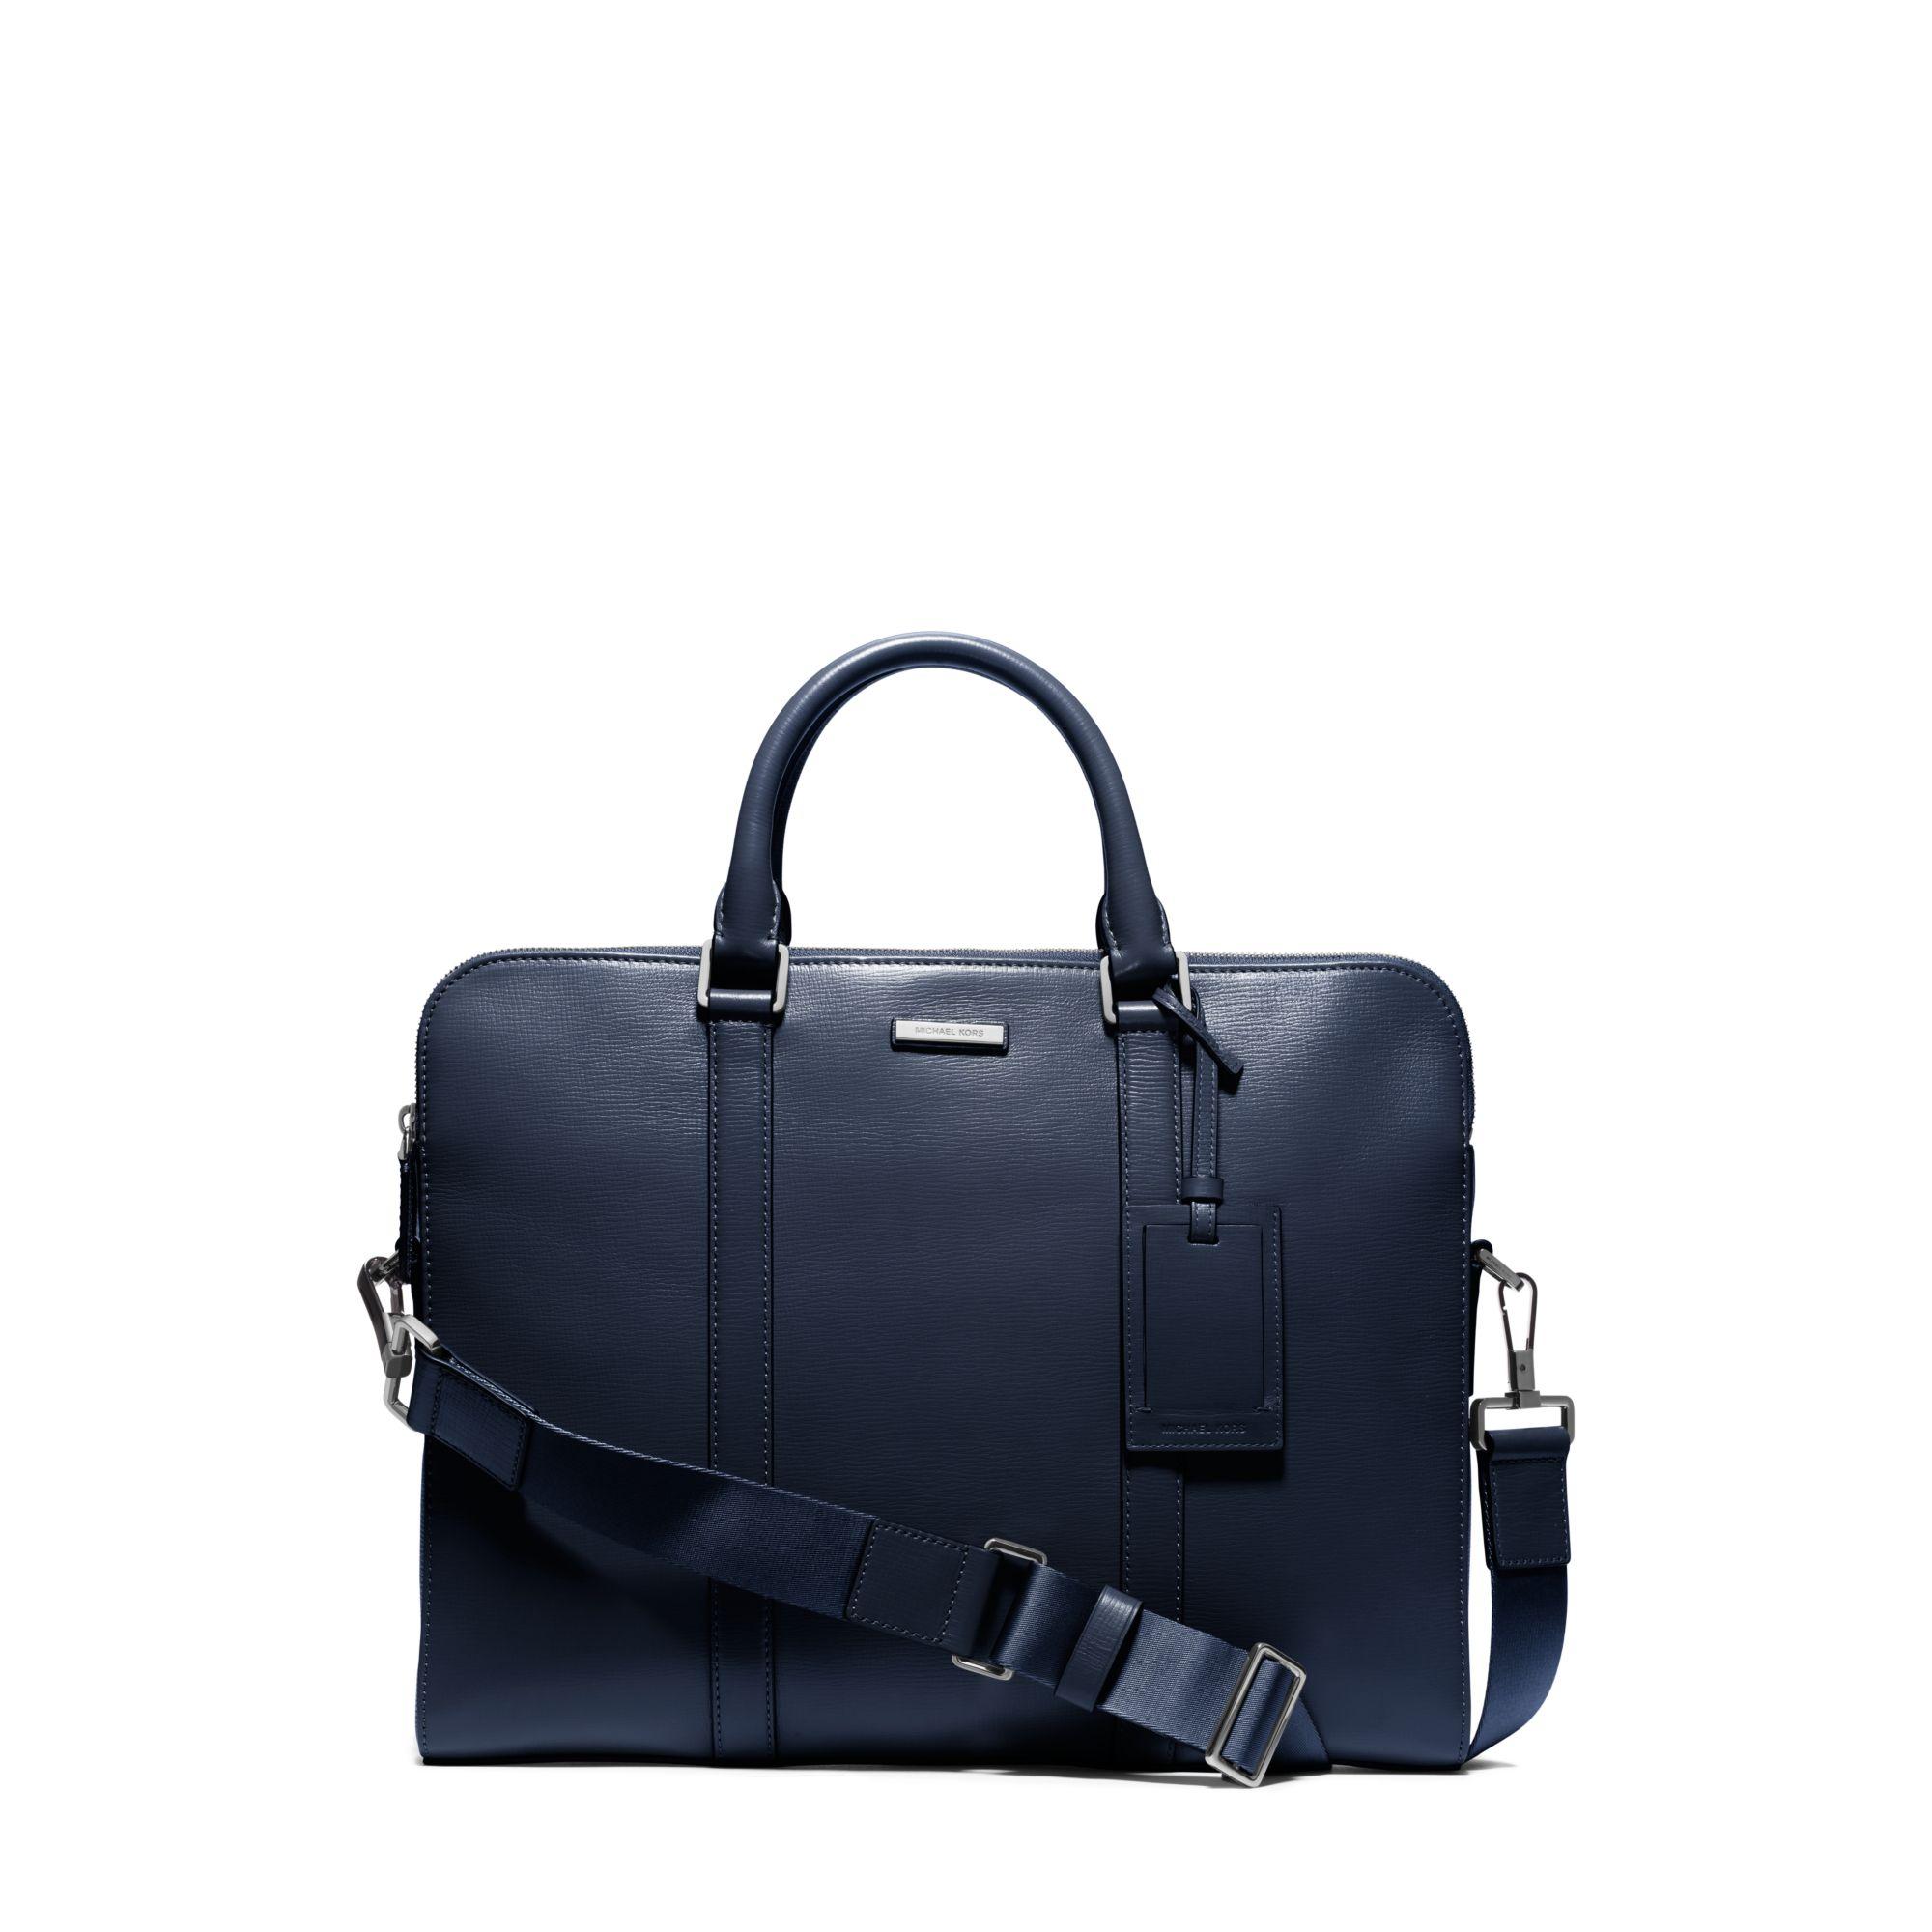 5c202d181 Michael Kors Warren Slim Leather Briefcase in Blue for Men - Lyst